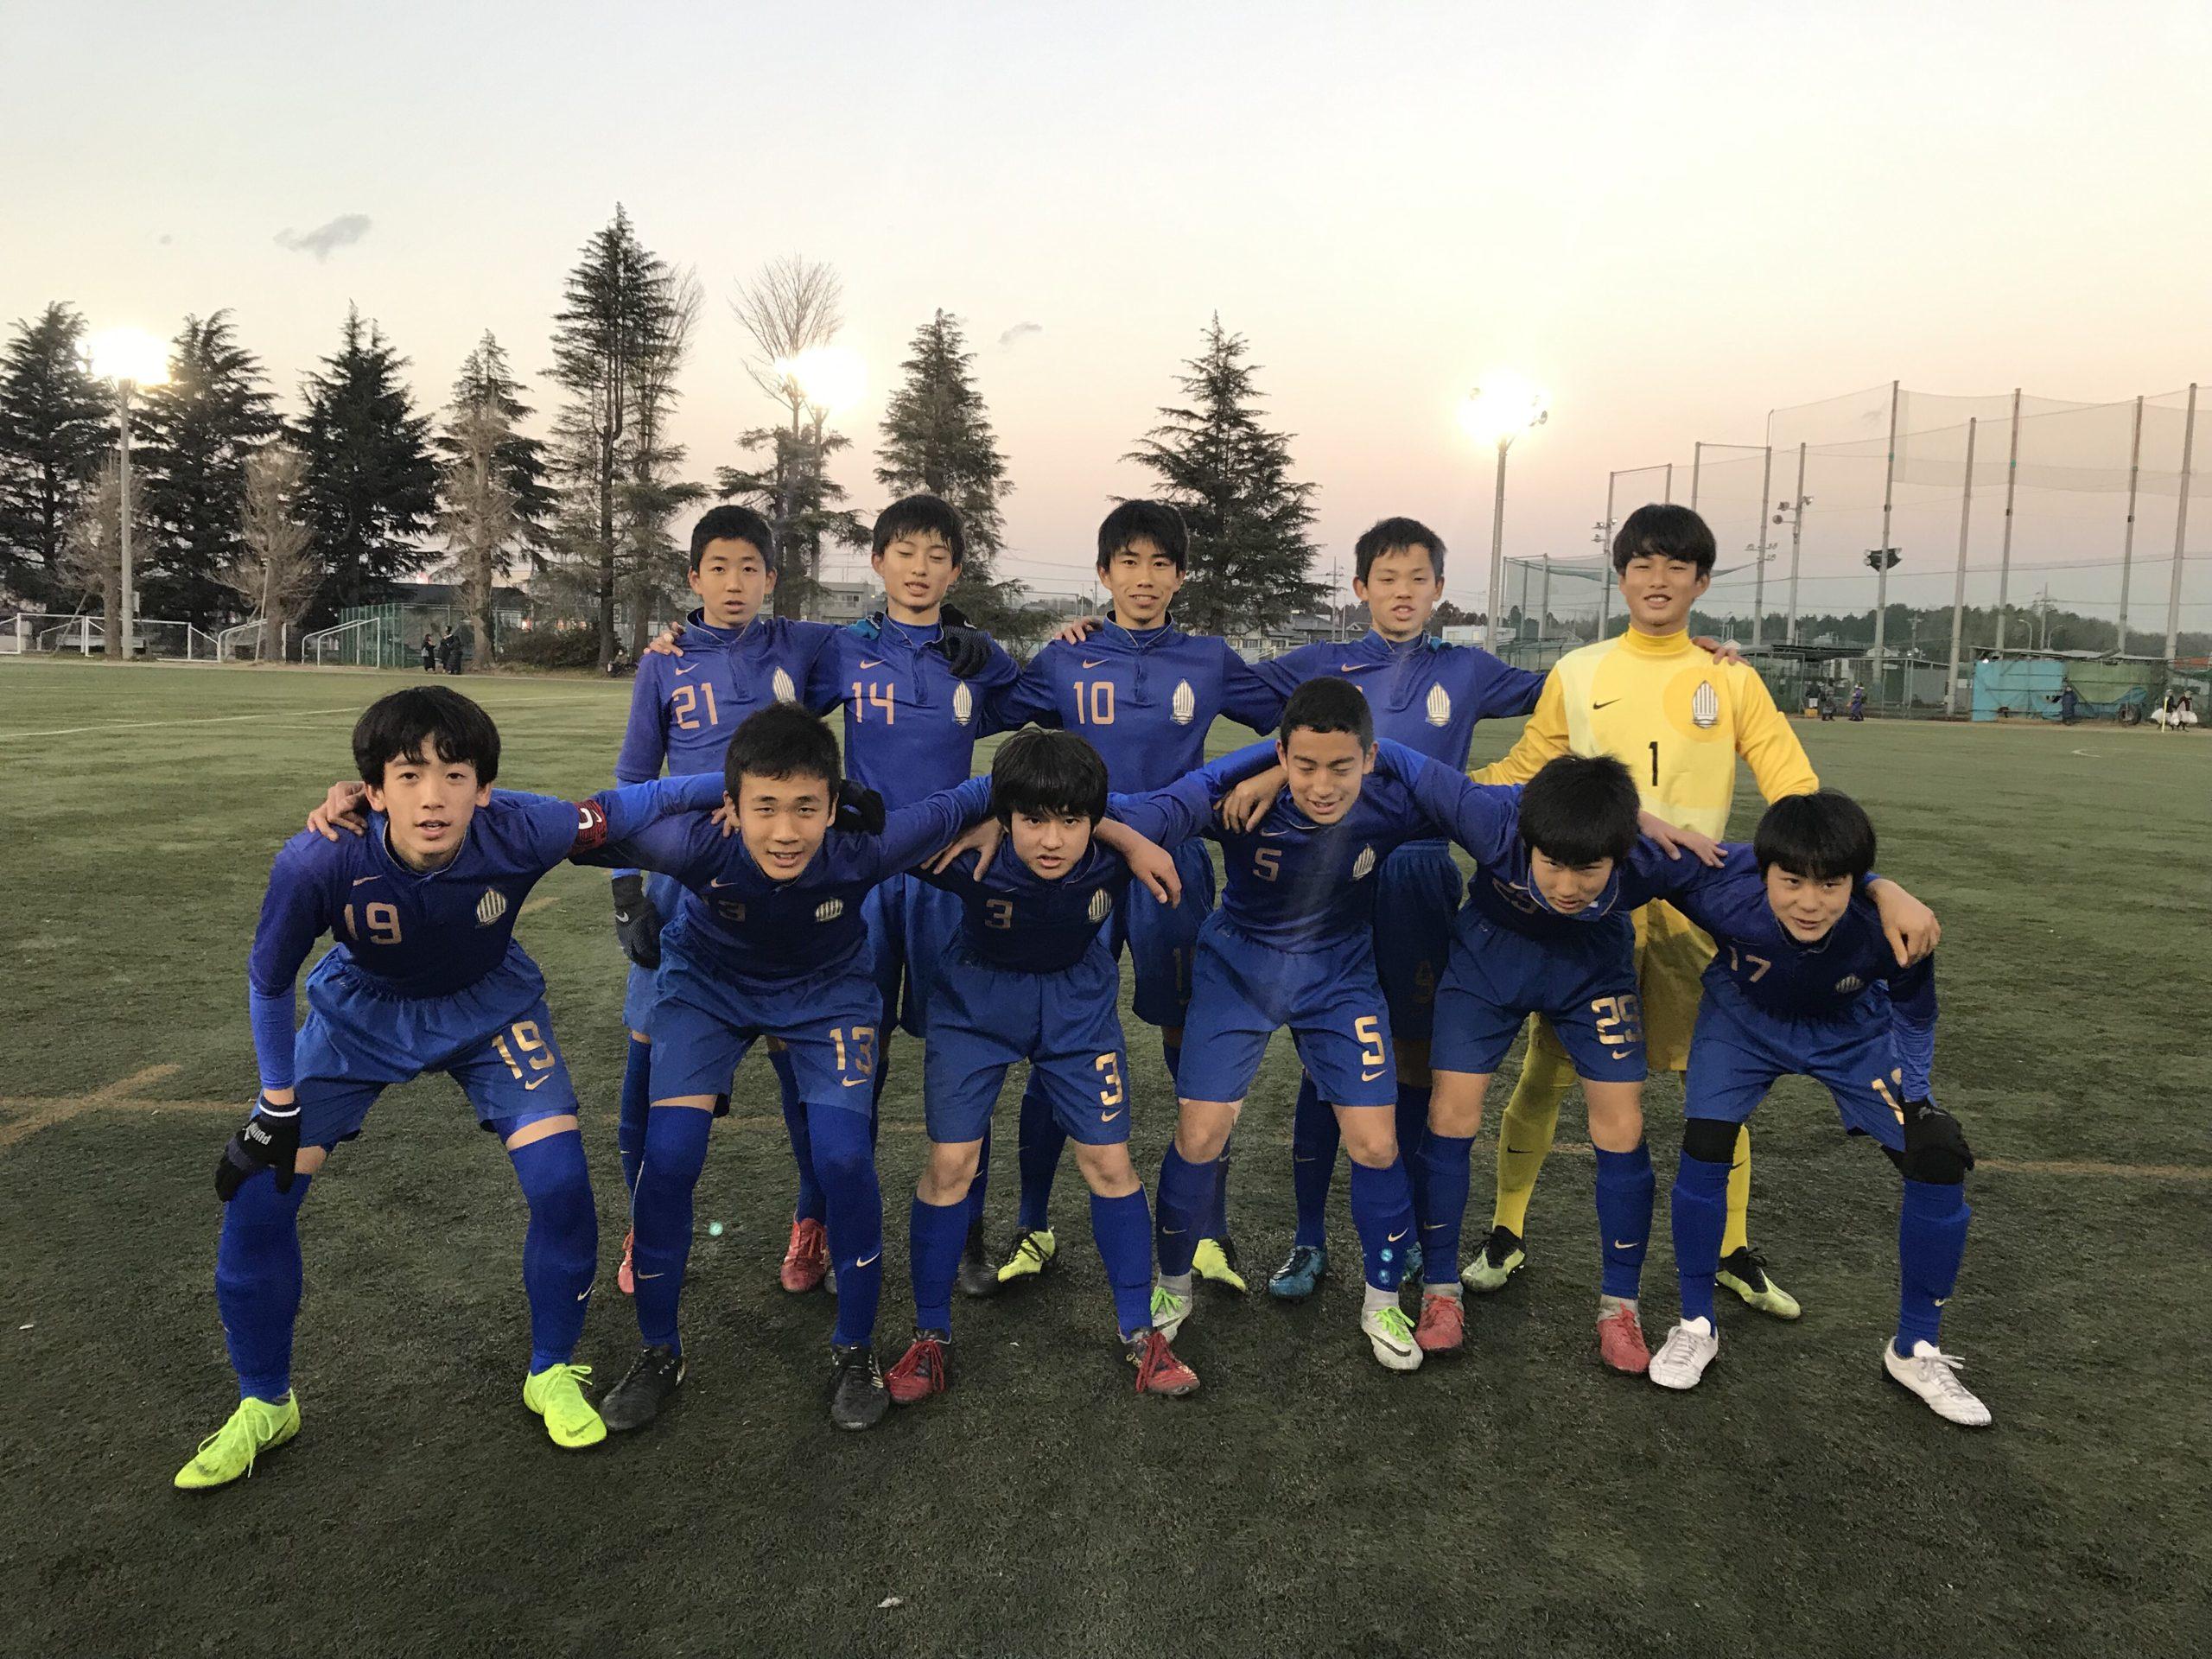 【U15】高円宮杯 U-15サッカー千葉県1部リーグ 第2節